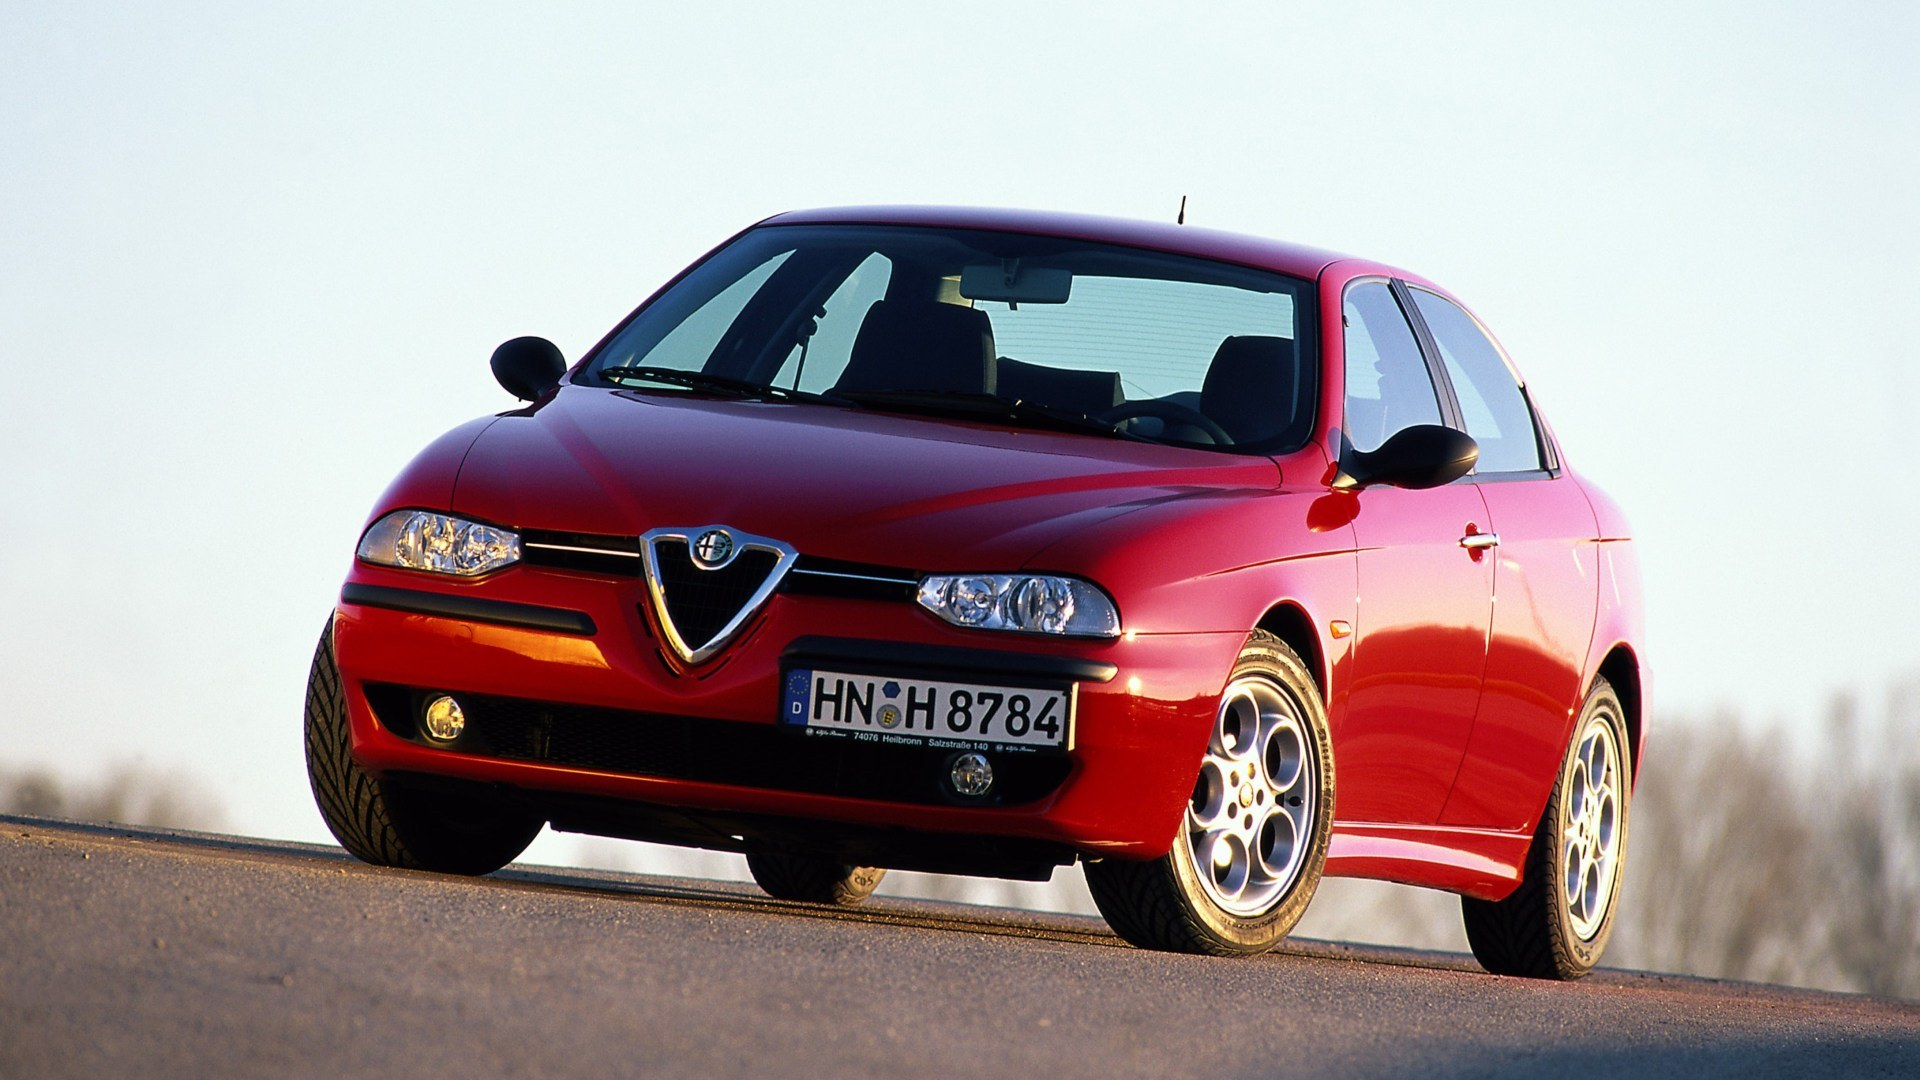 Guía de compra: Alfa Romeo 156 (932)